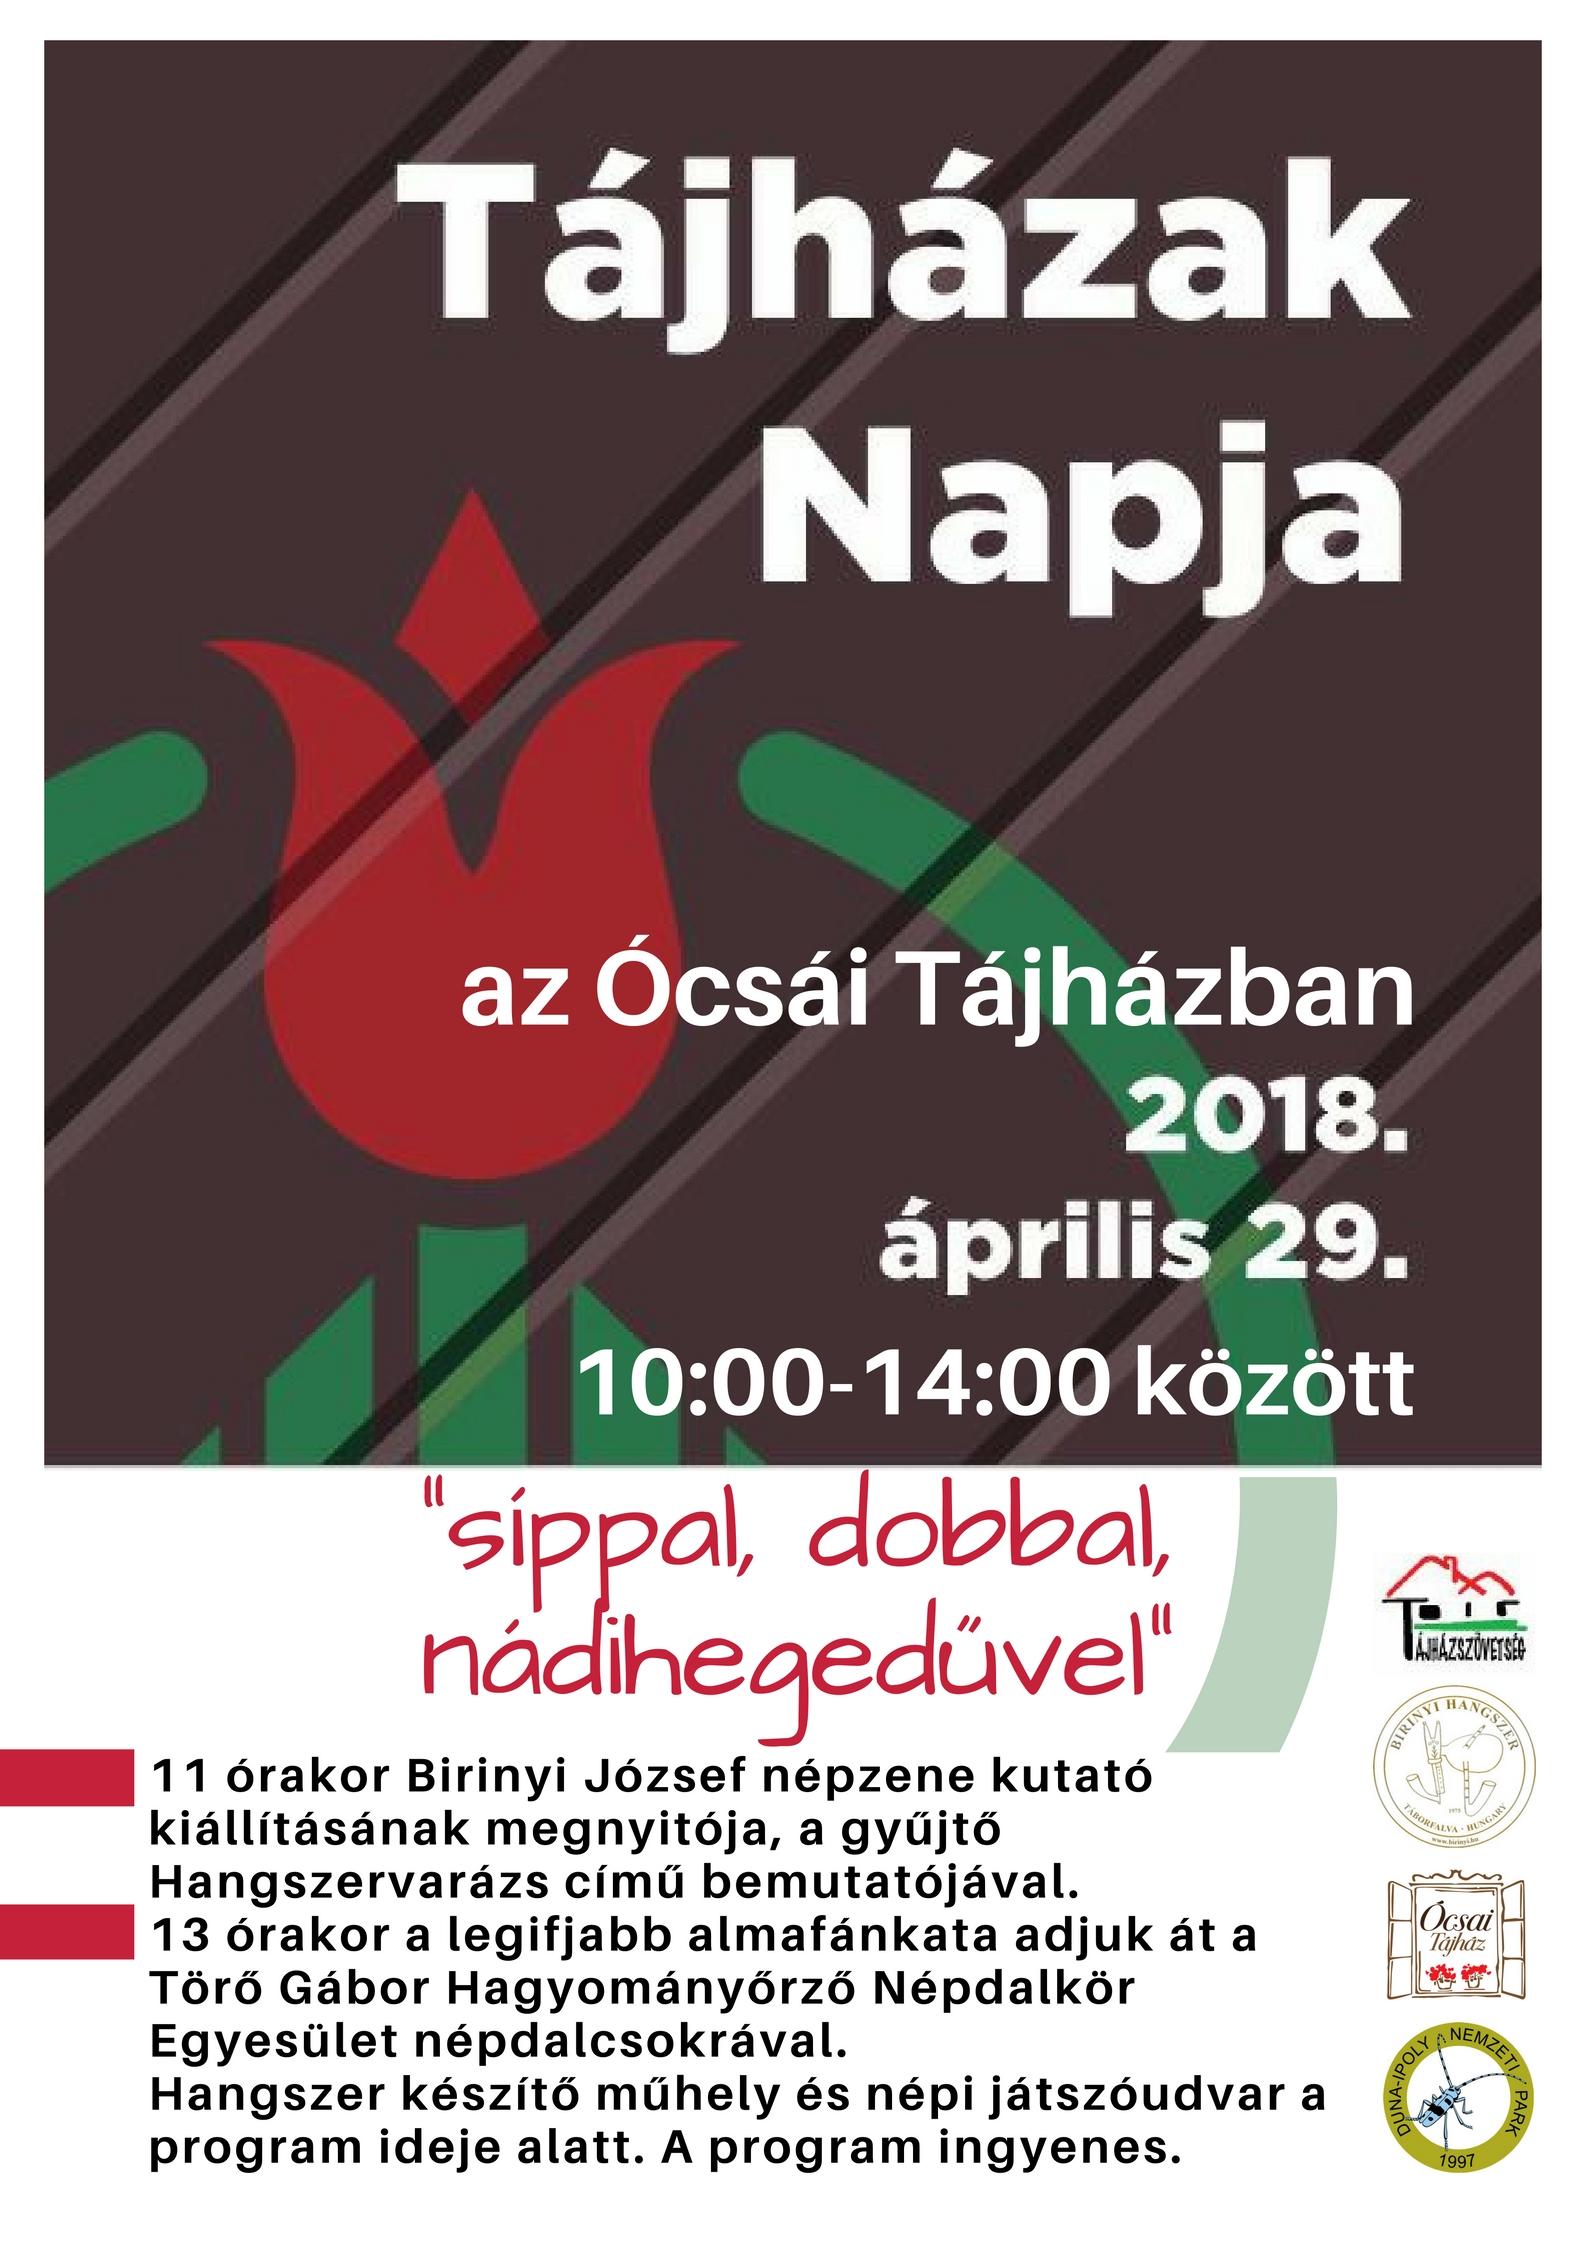 2018_tajhazak_napja.jpg